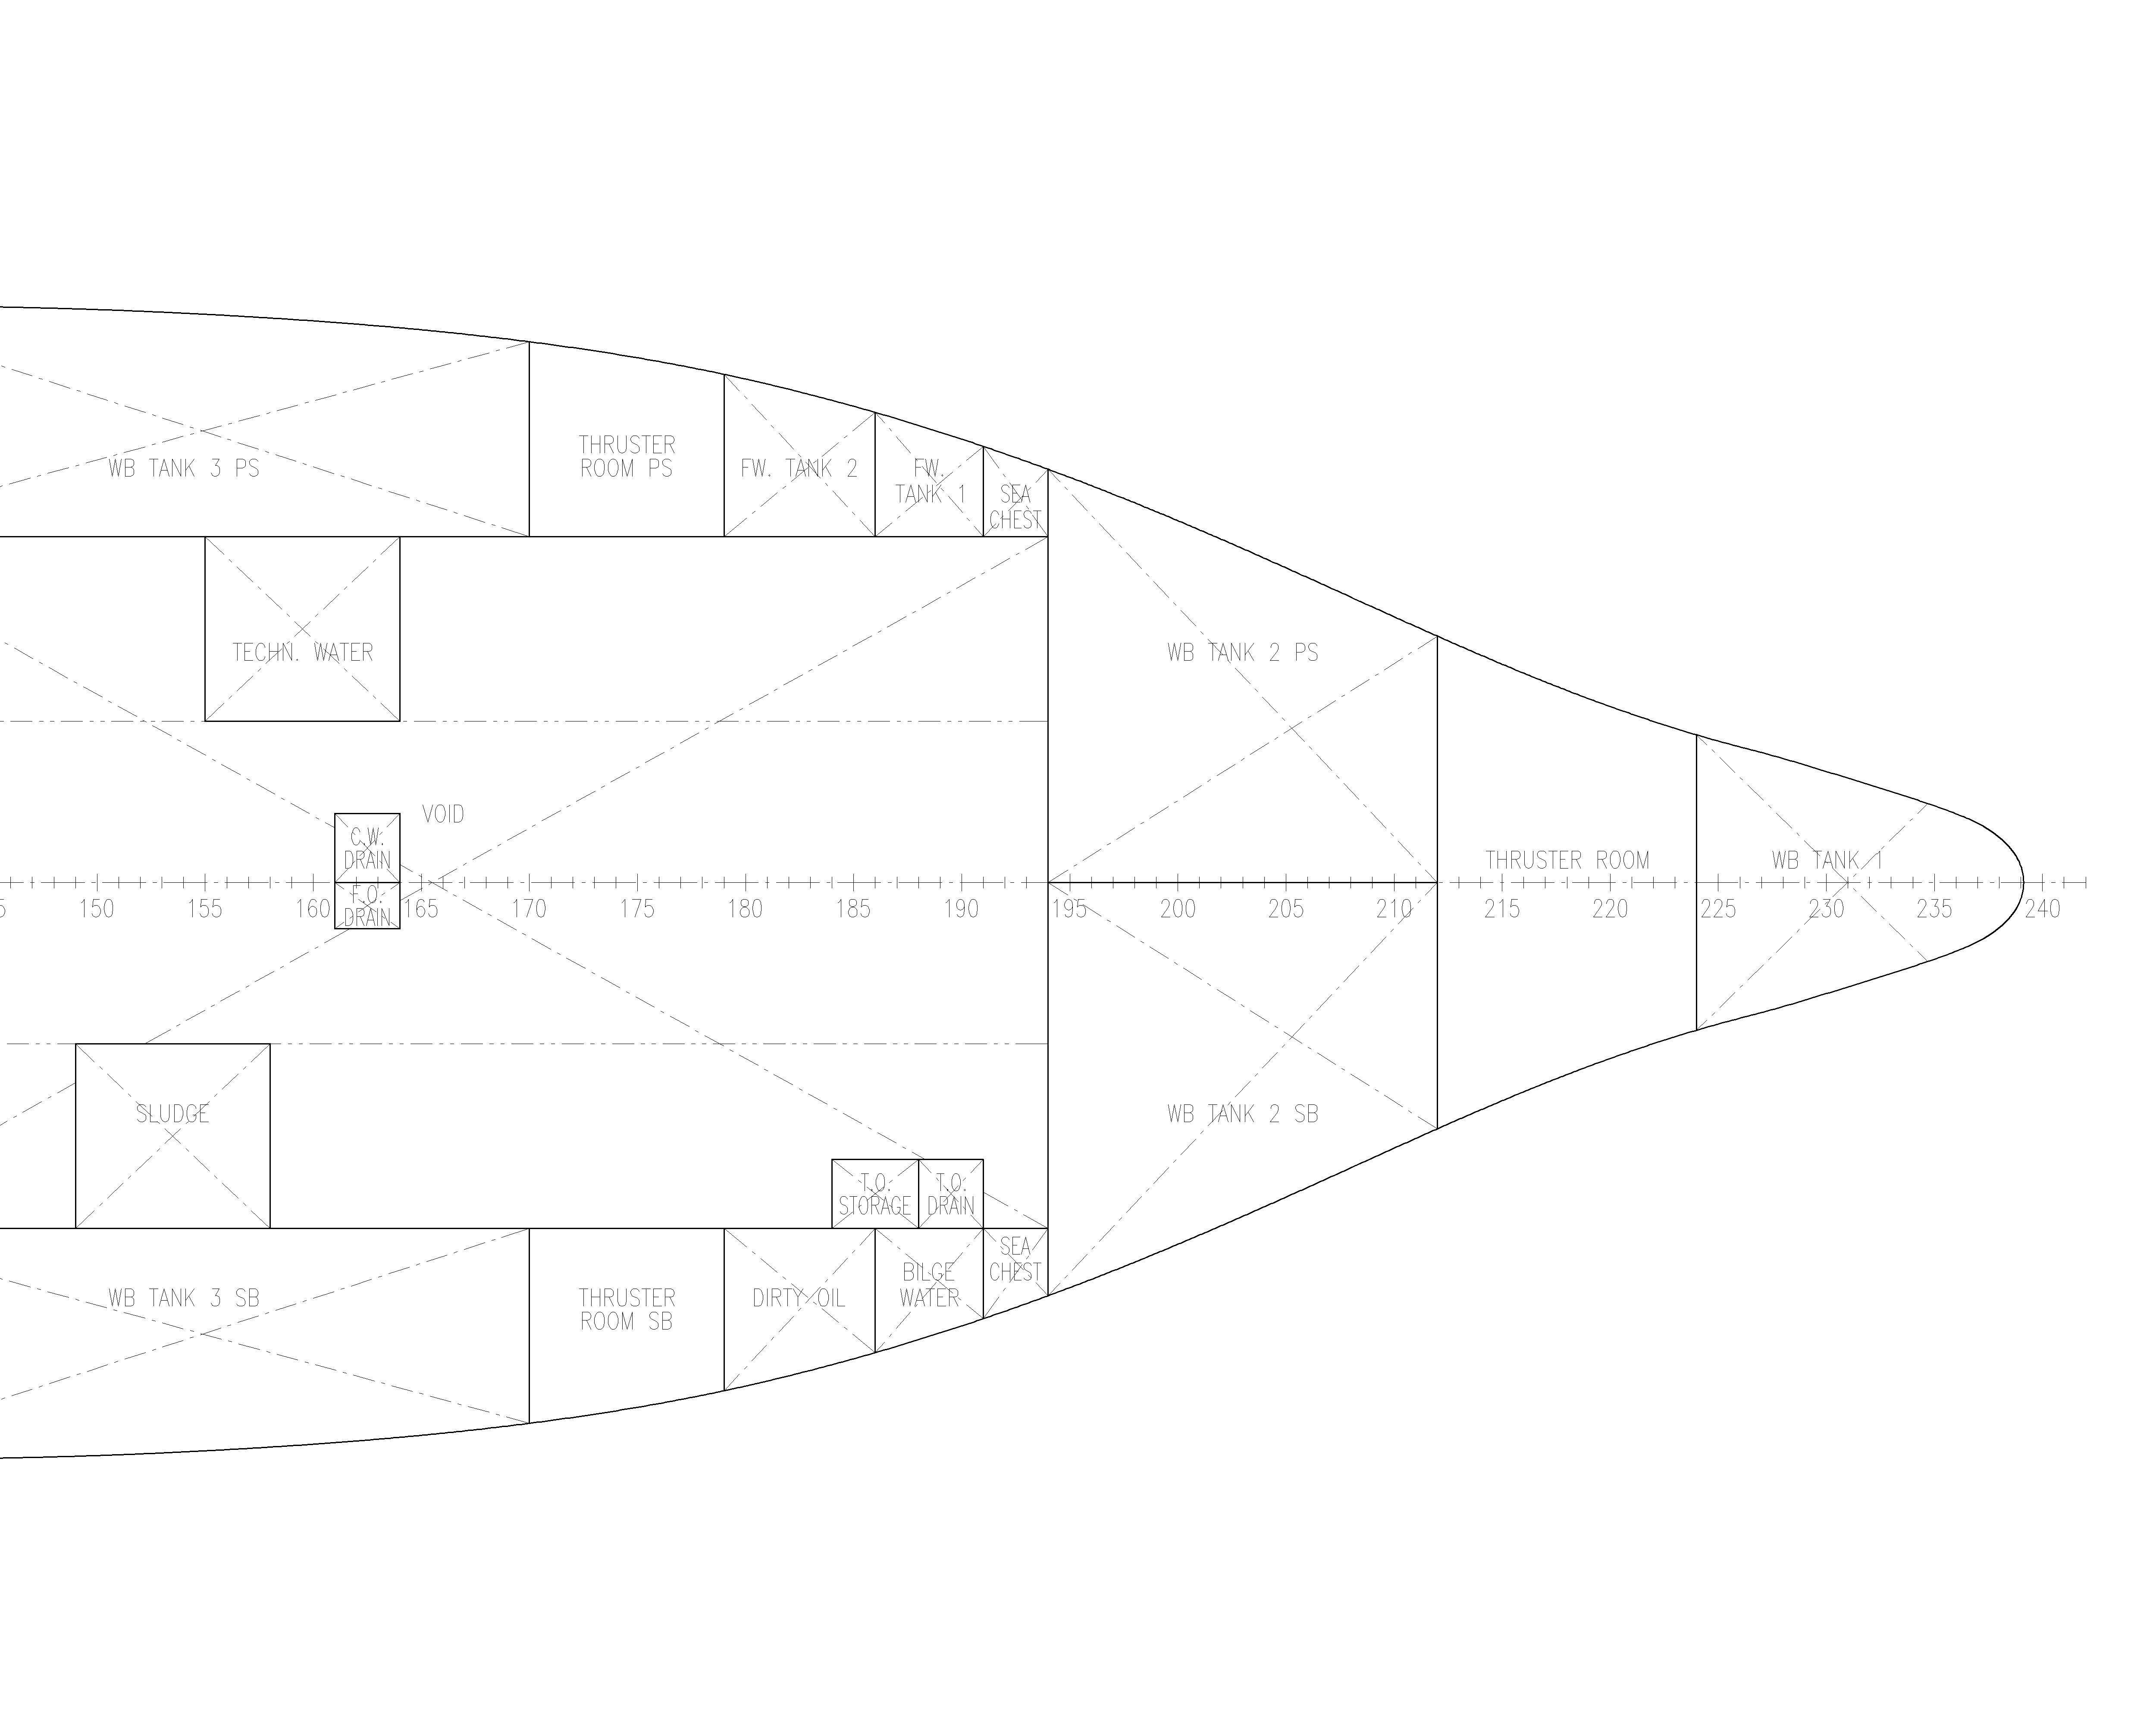 Image: Tank arrangement